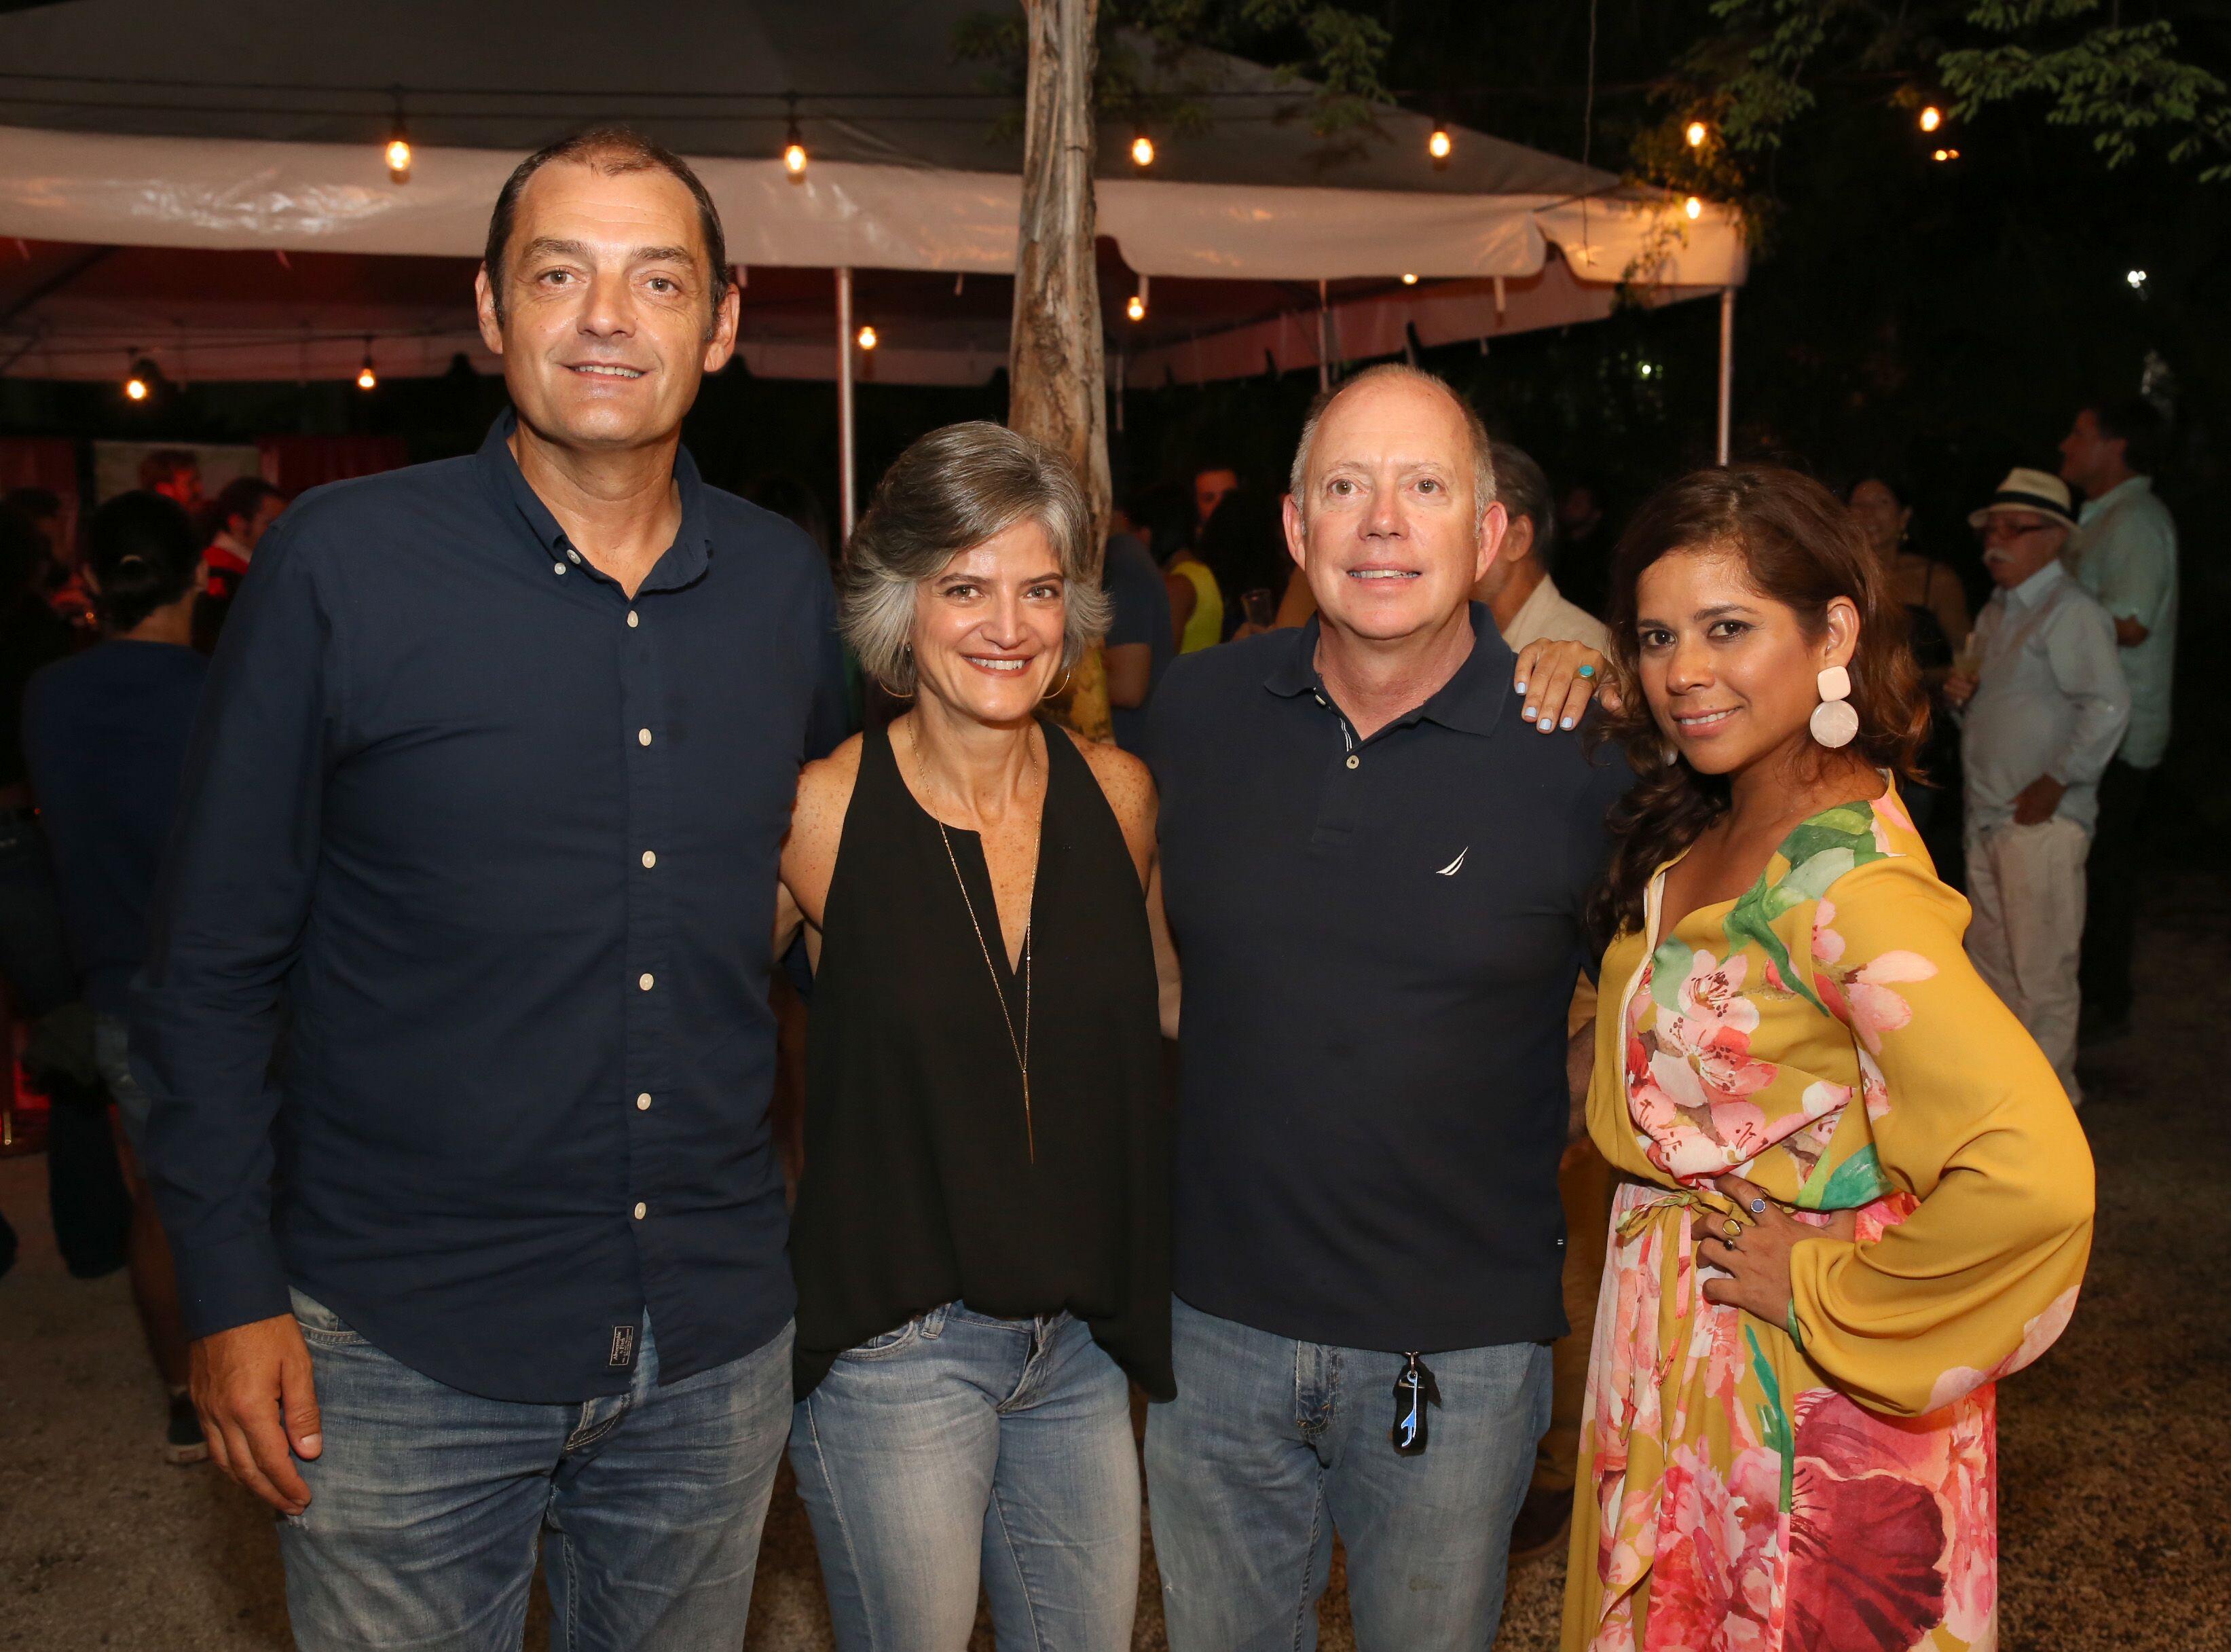 Juan Luis Carril, Sofia Moraskie, Mike Moraskie y Cynthia Wiesner. (Suministrada)